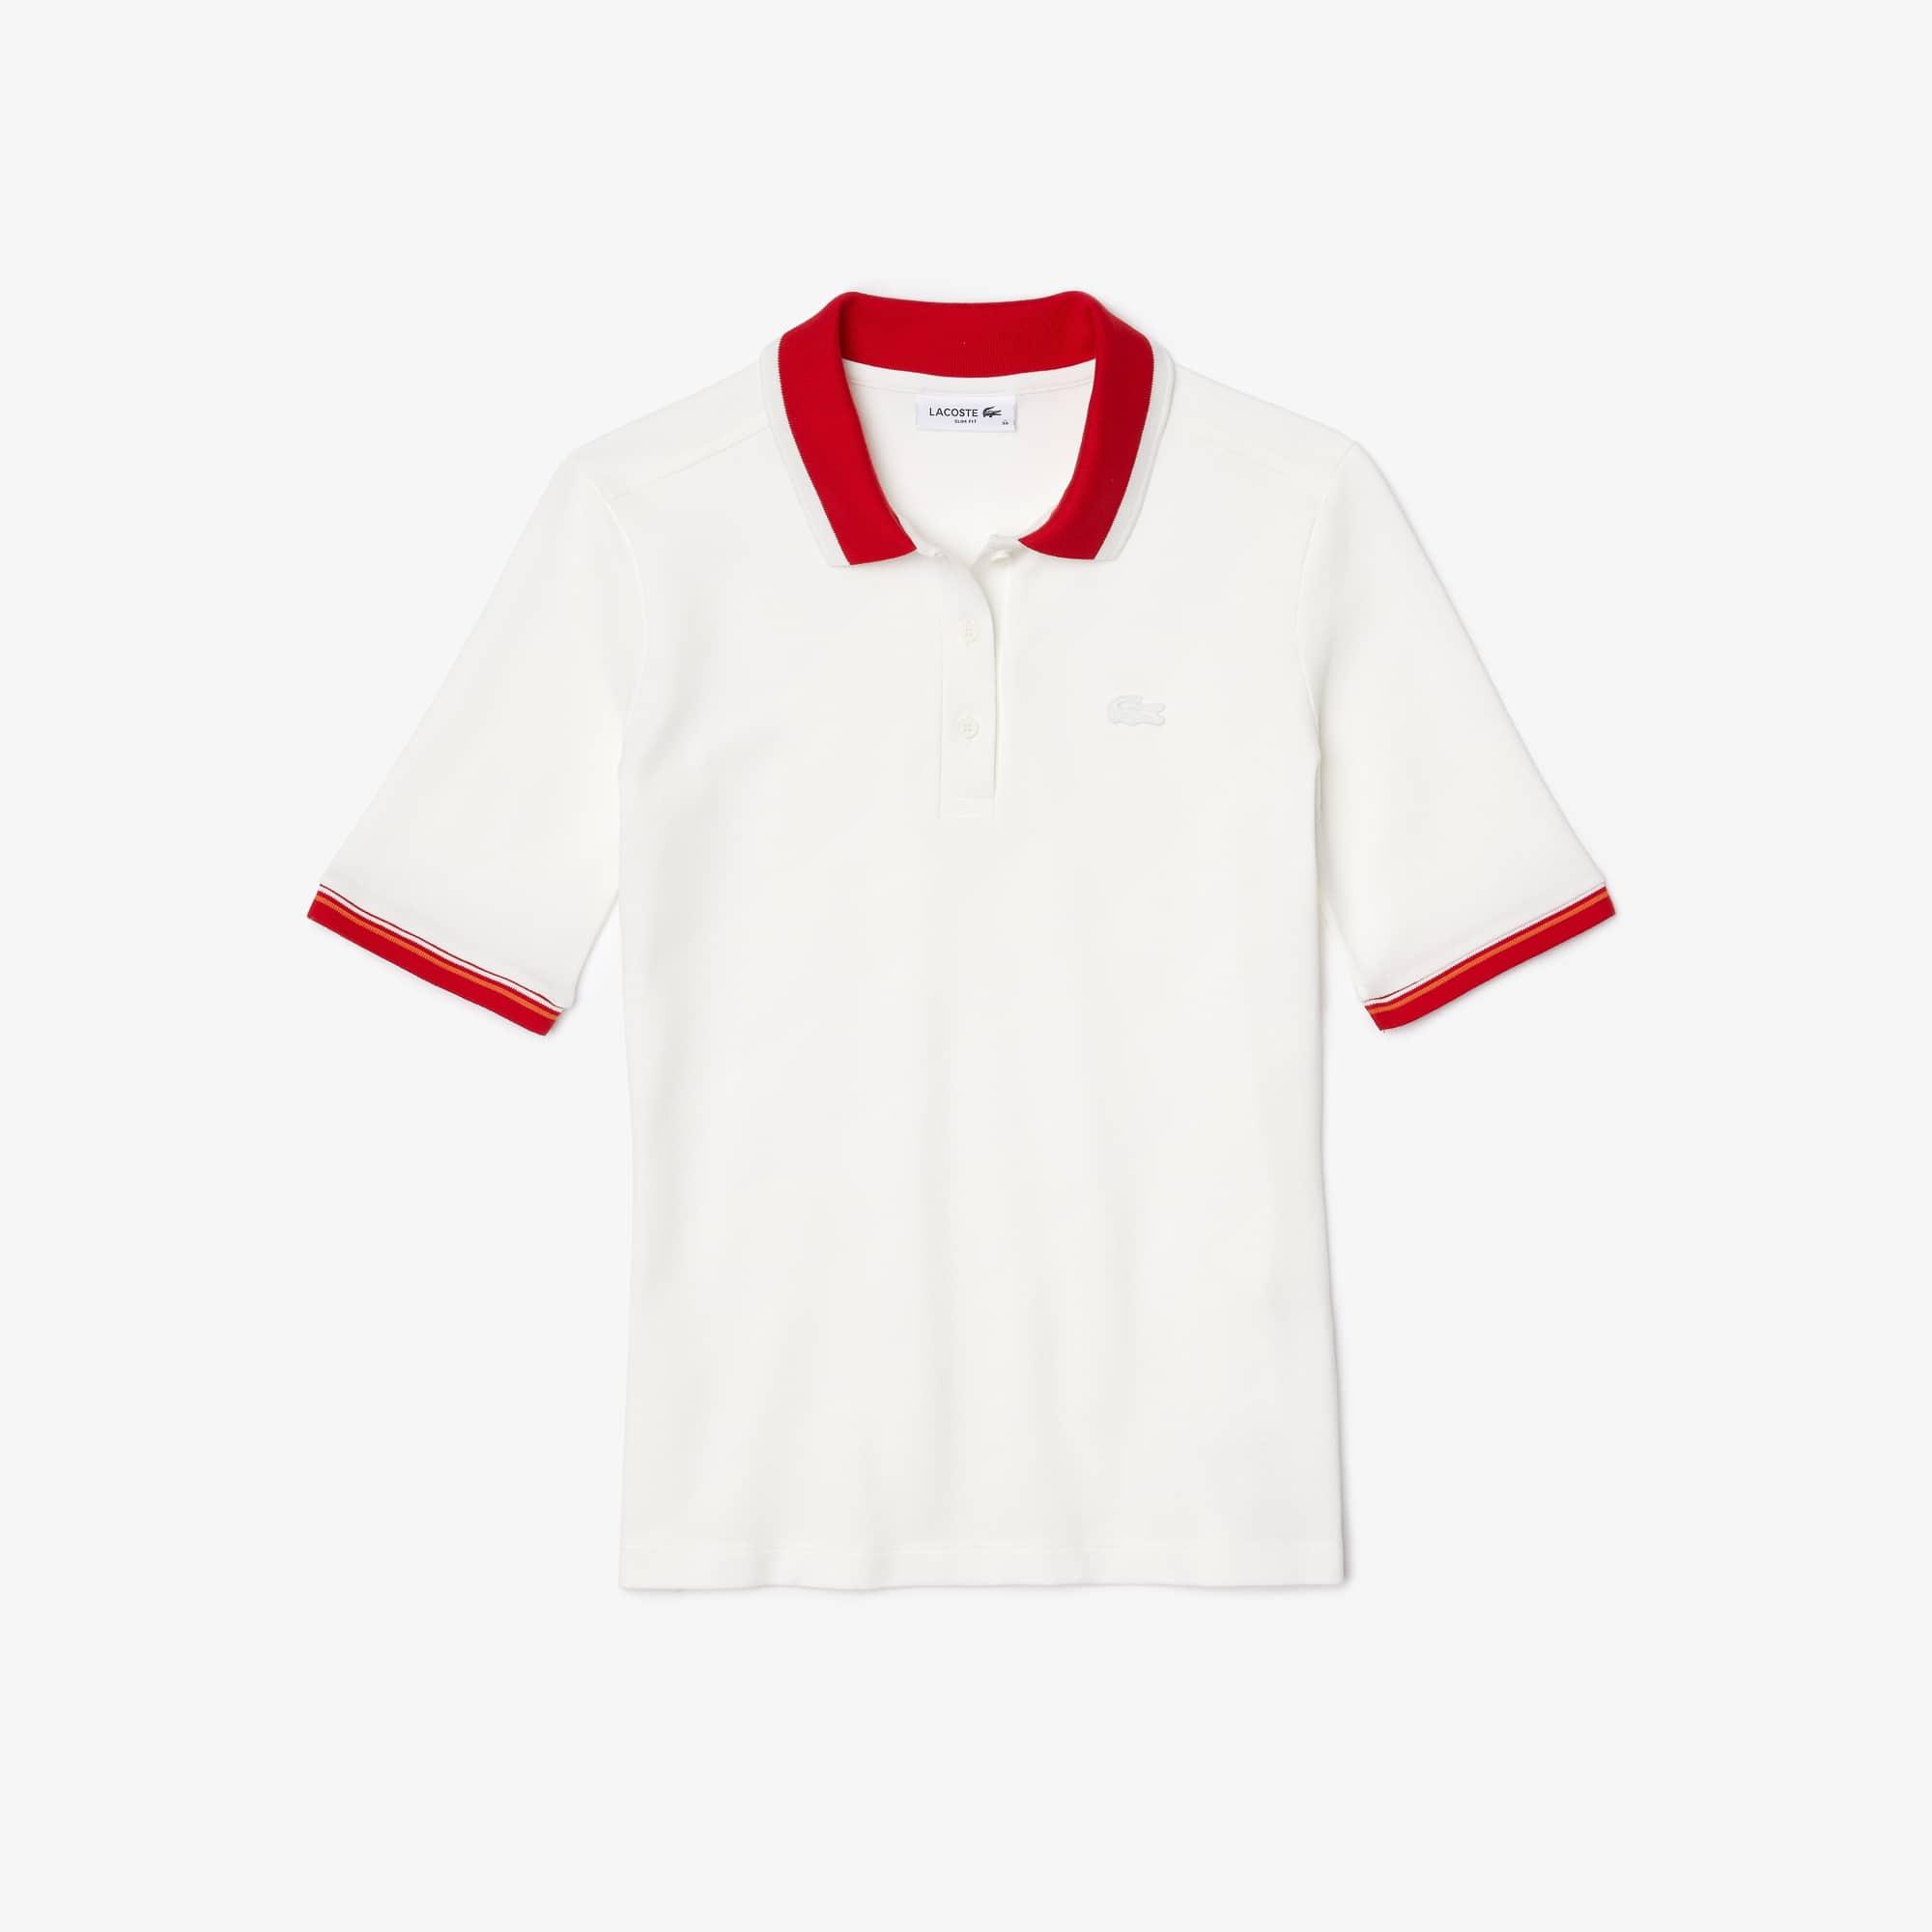 Lacoste Women's Slim Fit Colored Neck Stretch Cotton Pique Polo